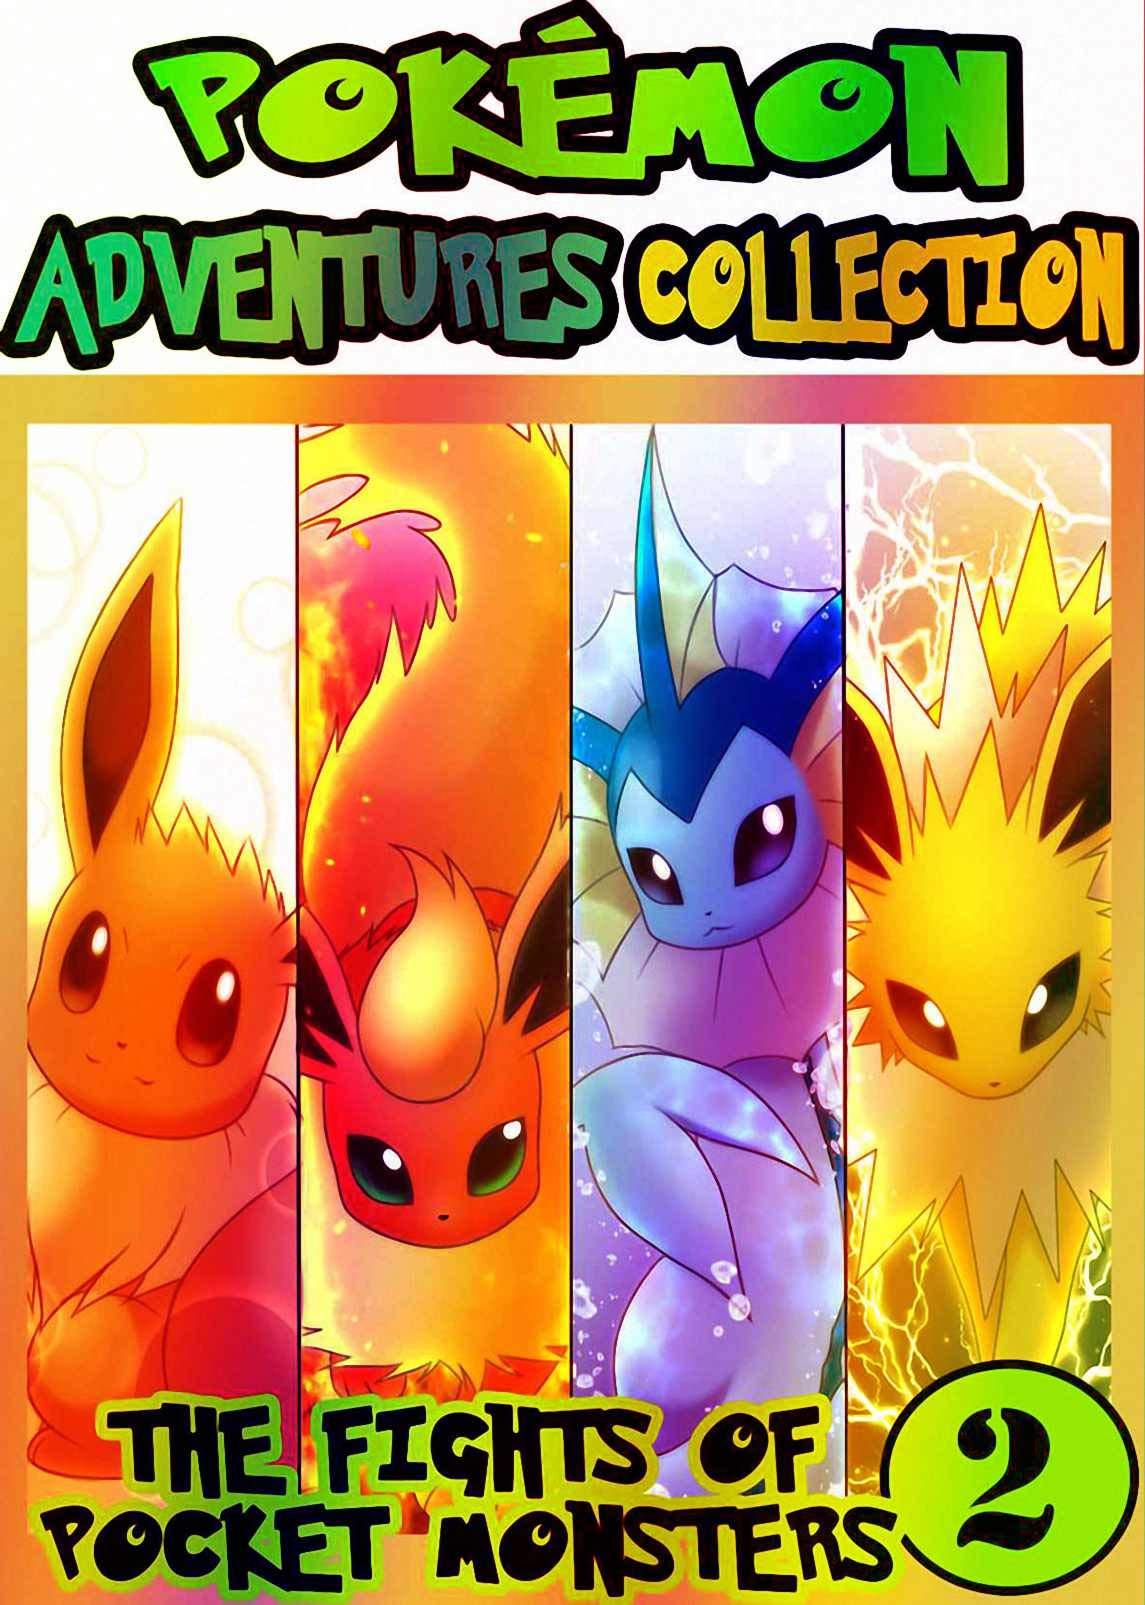 Pocket Adventure: Collection Pack 2 - Pocket Monsters Manga Adventures Pokemon Graphic Novel For Kids, Children